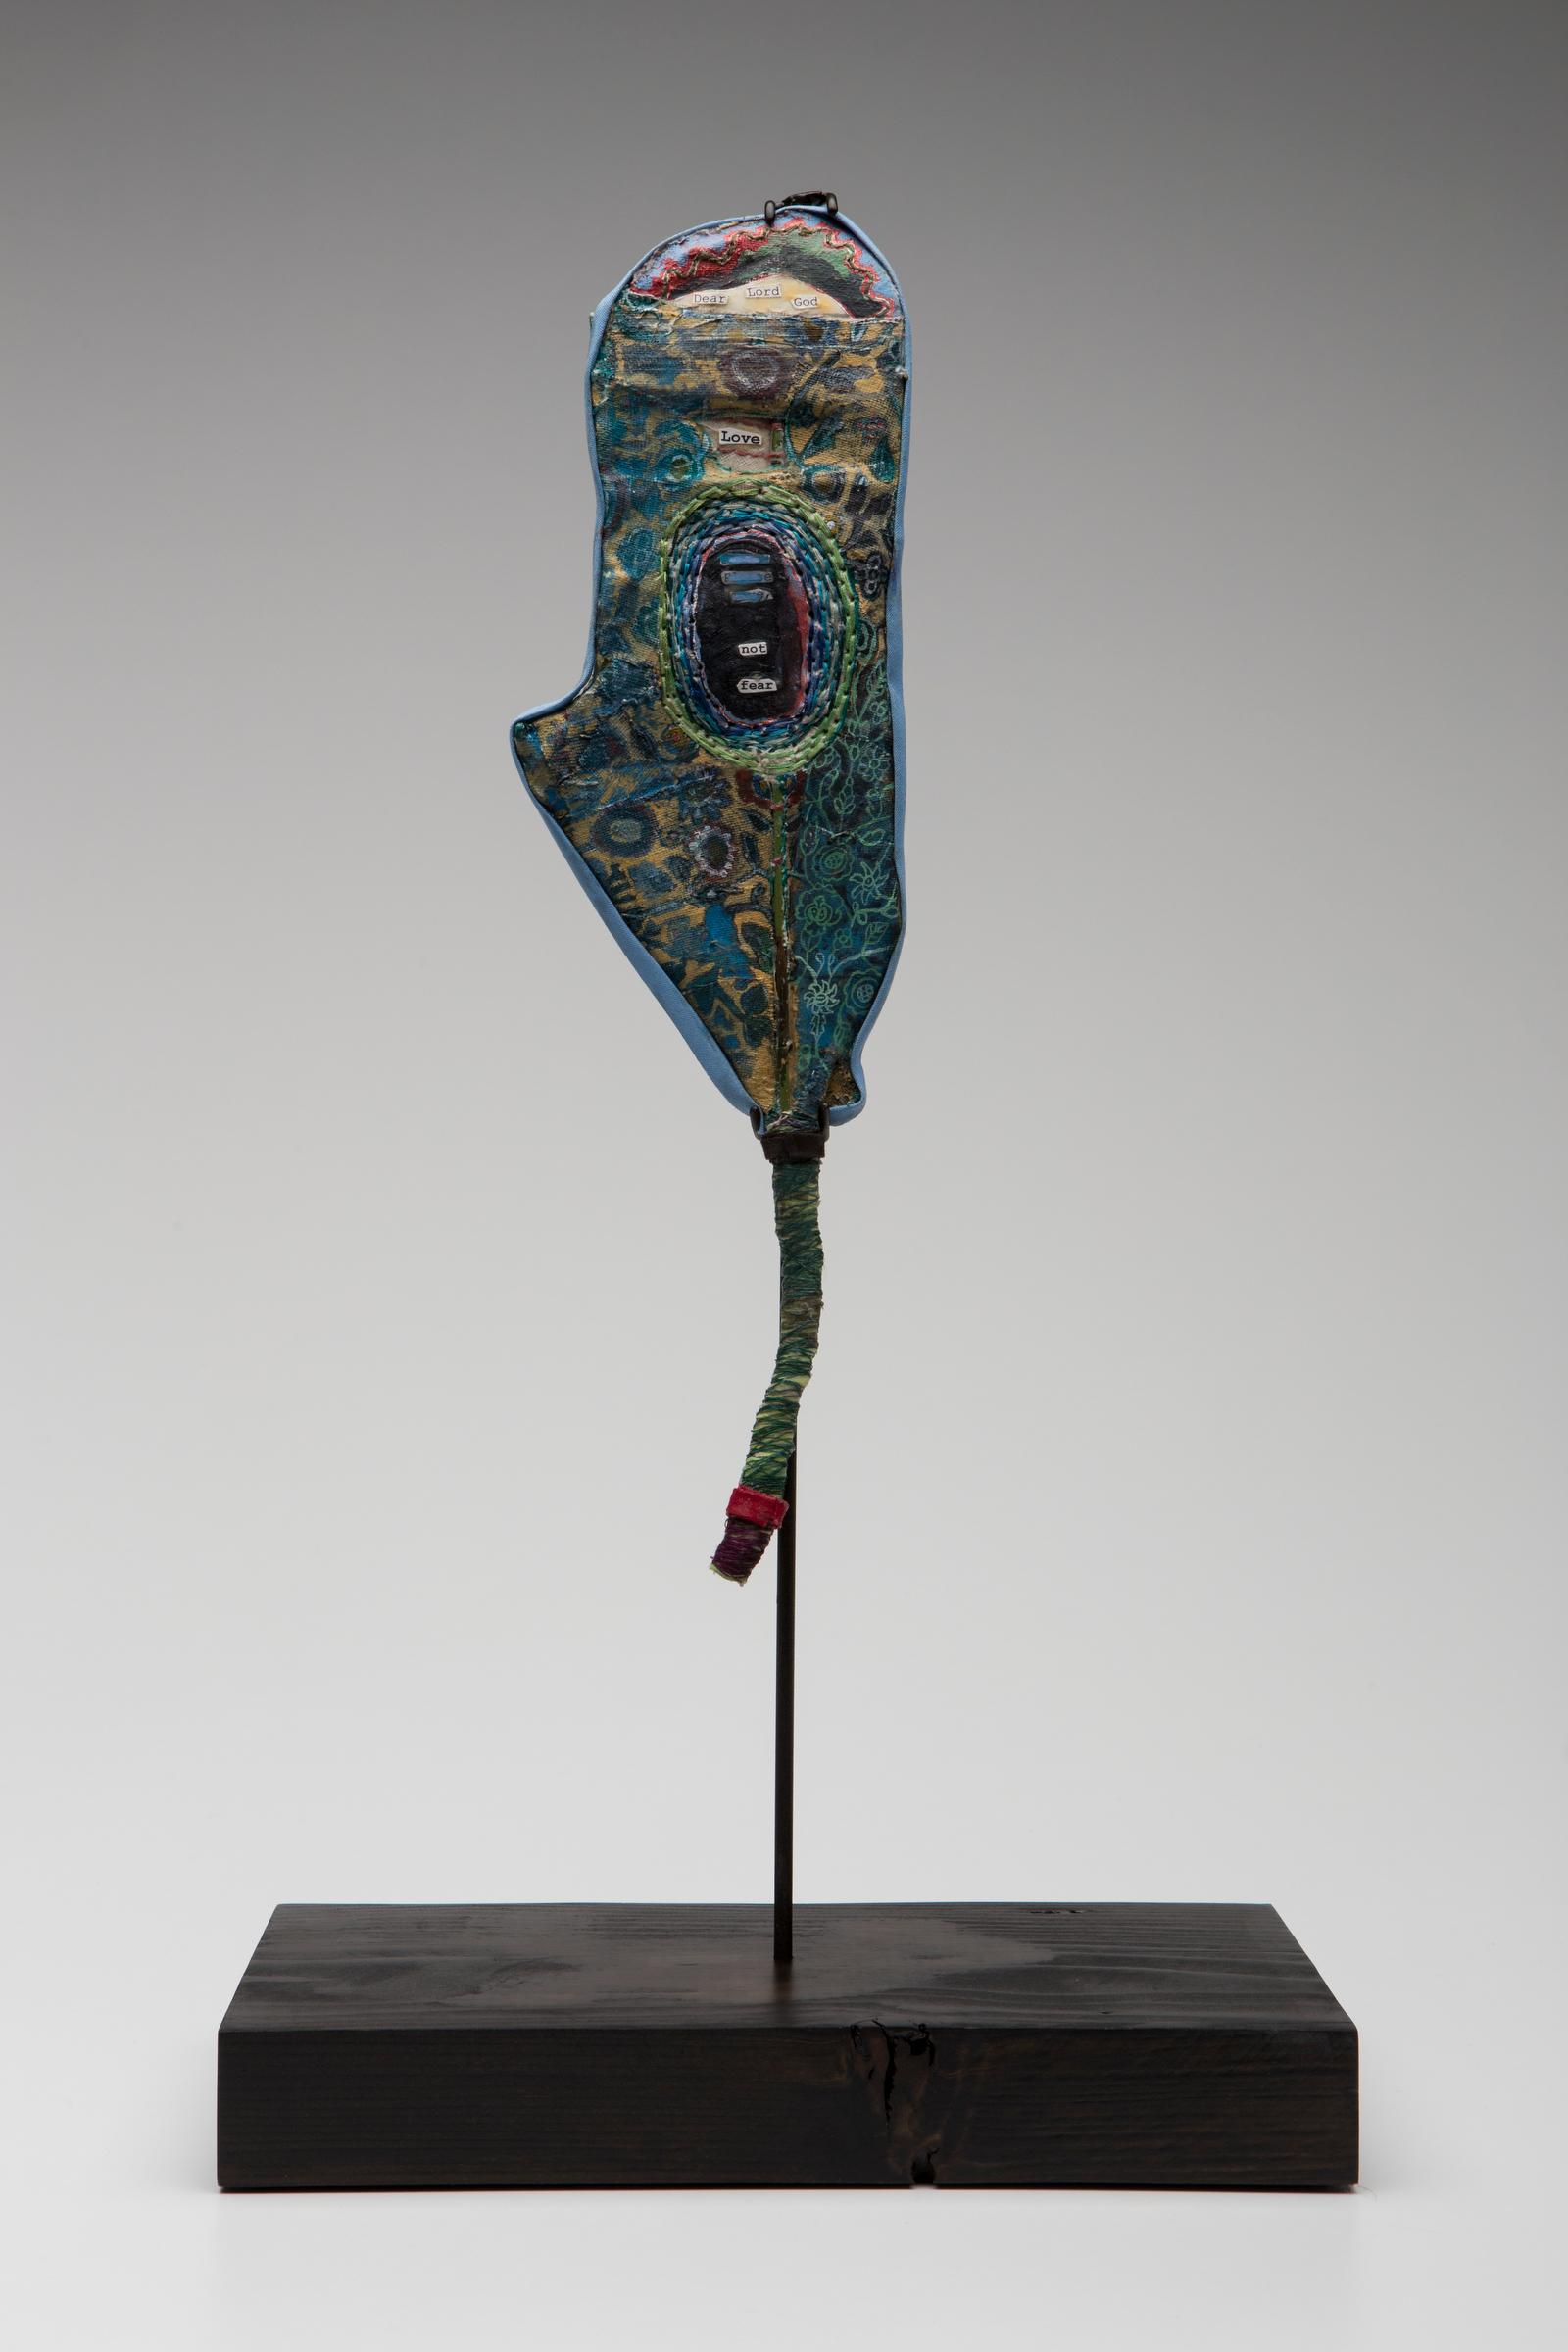 Prayer Paddles , Installation View, Sherry Leedy Contemporary Art, Kansas City, Missouri, 2013.